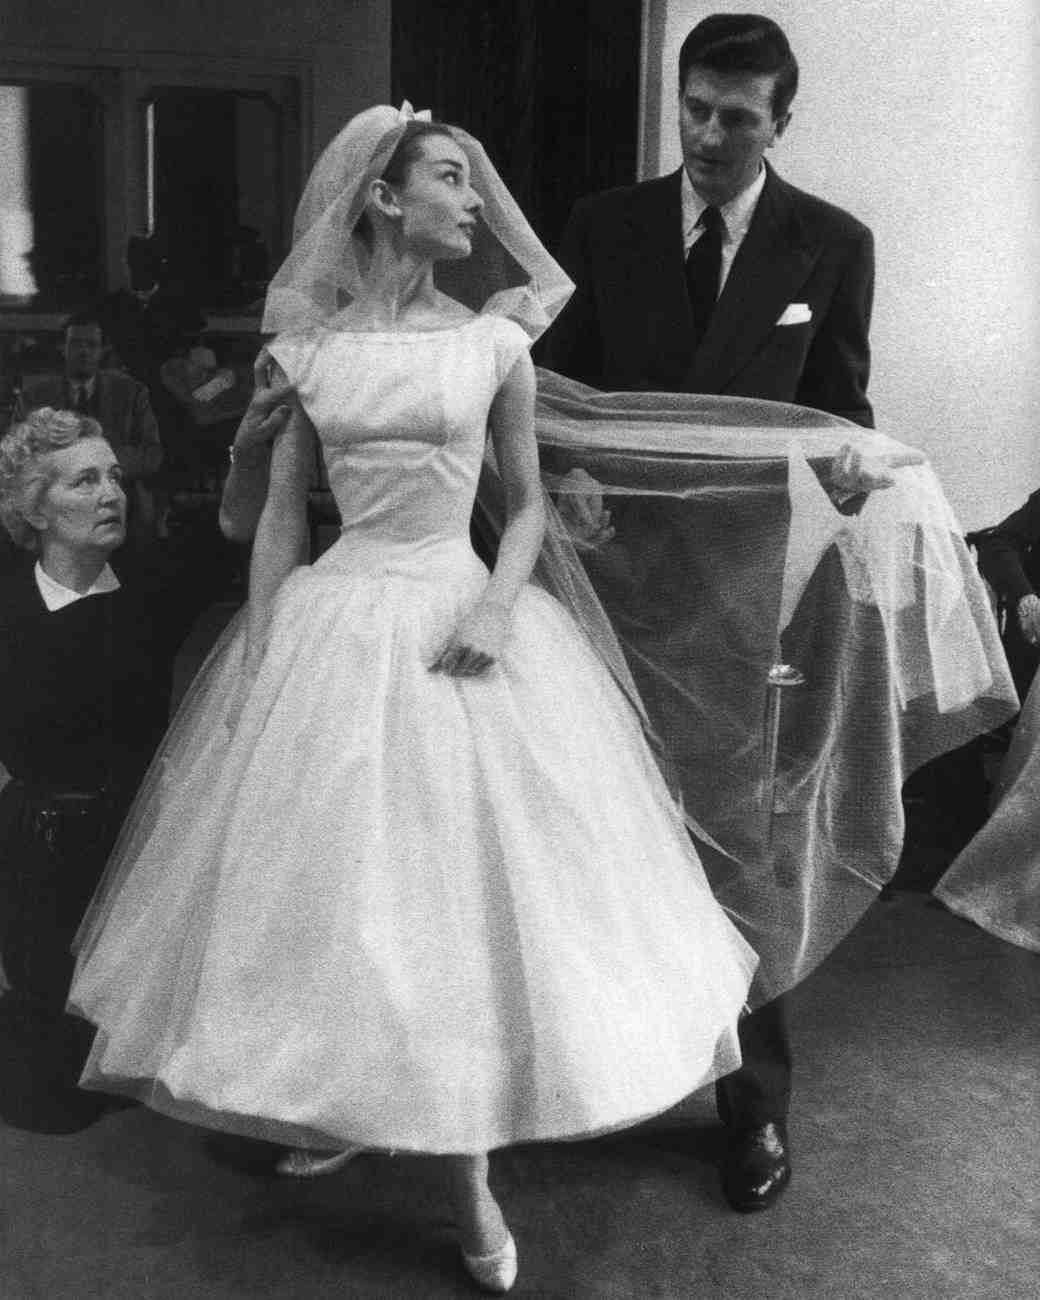 movie-wedding-dresses-funny-face-audrey-hepburn-0316.jpg